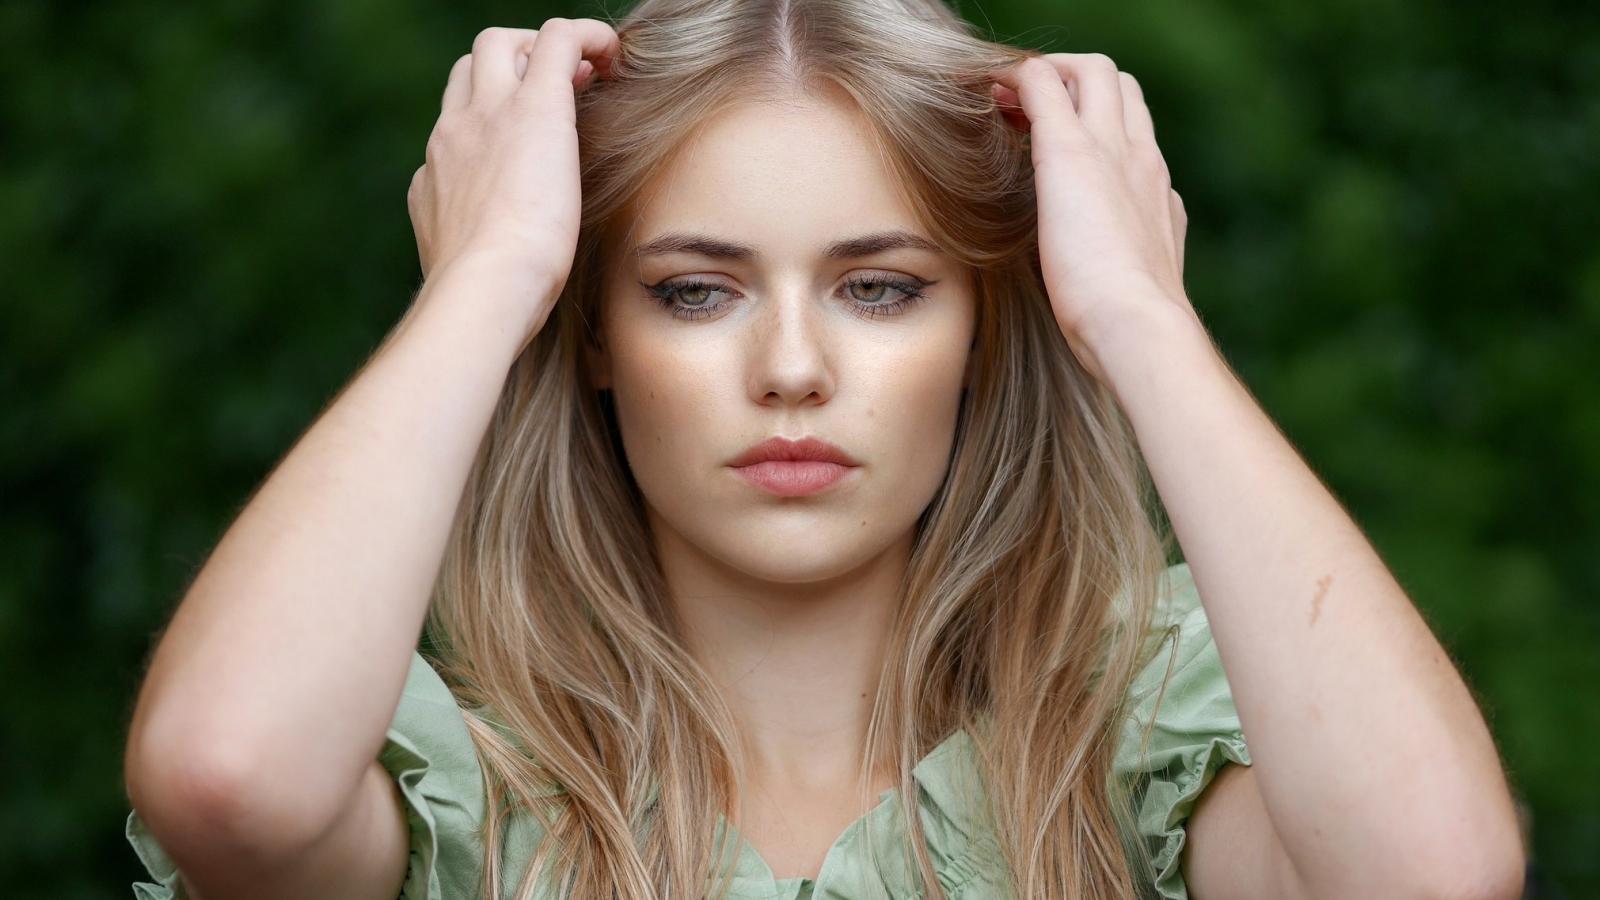 Pretty woman, blonde, model, beautiful, 1600x900 wallpaper